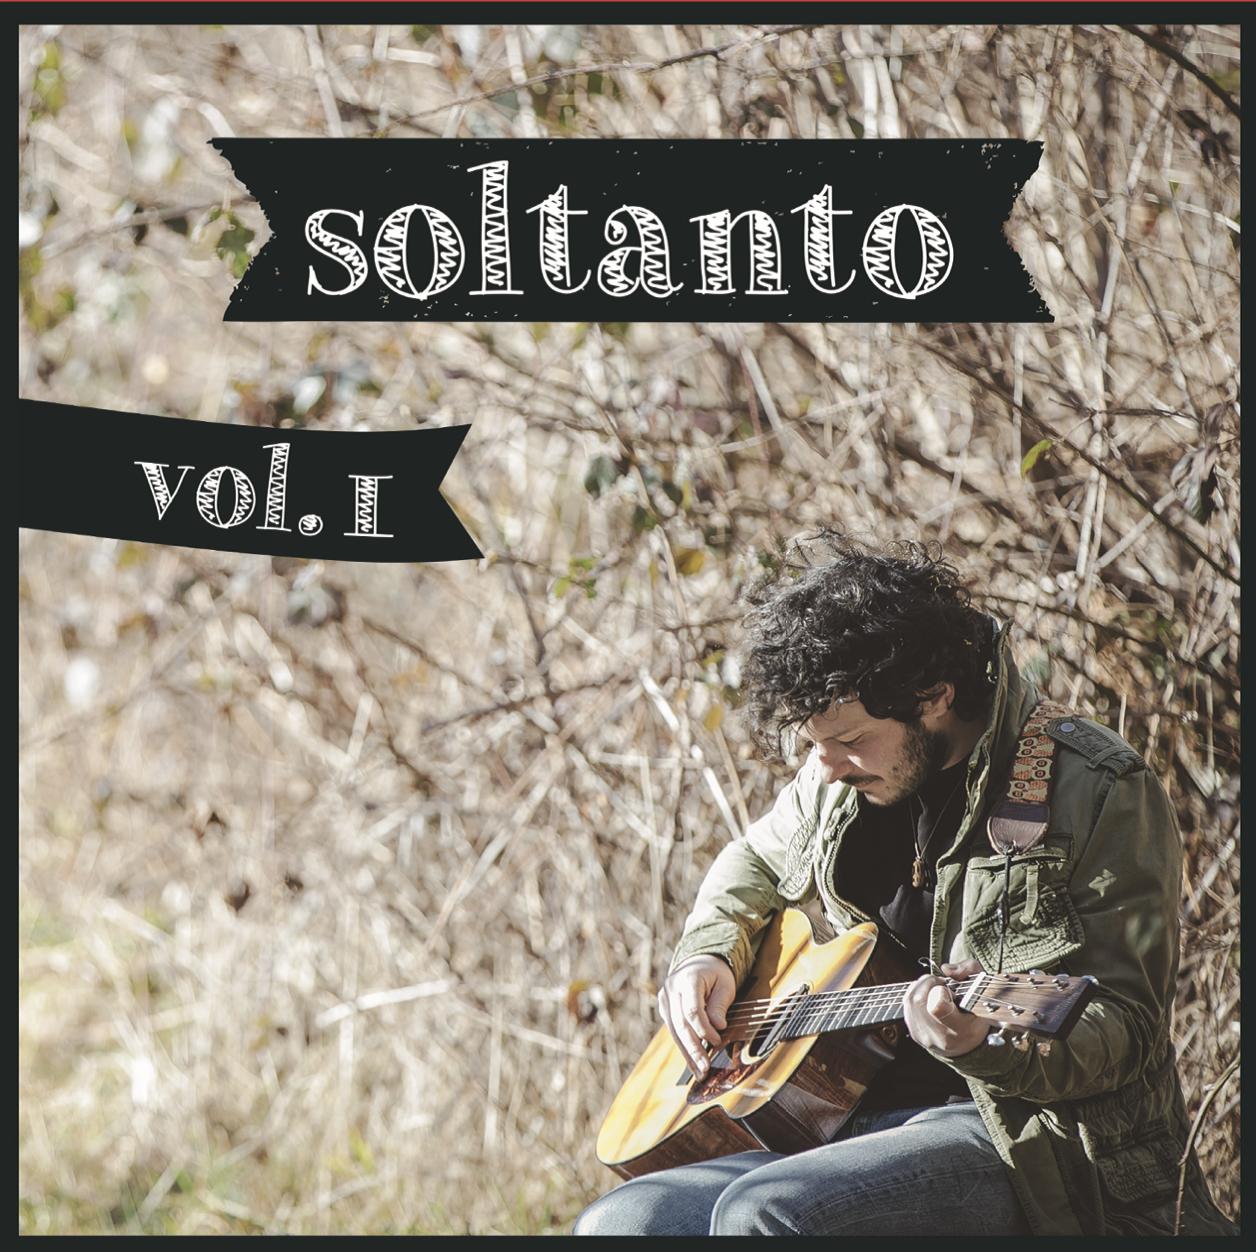 CD Volume 1 (cover songs) - Physical CD